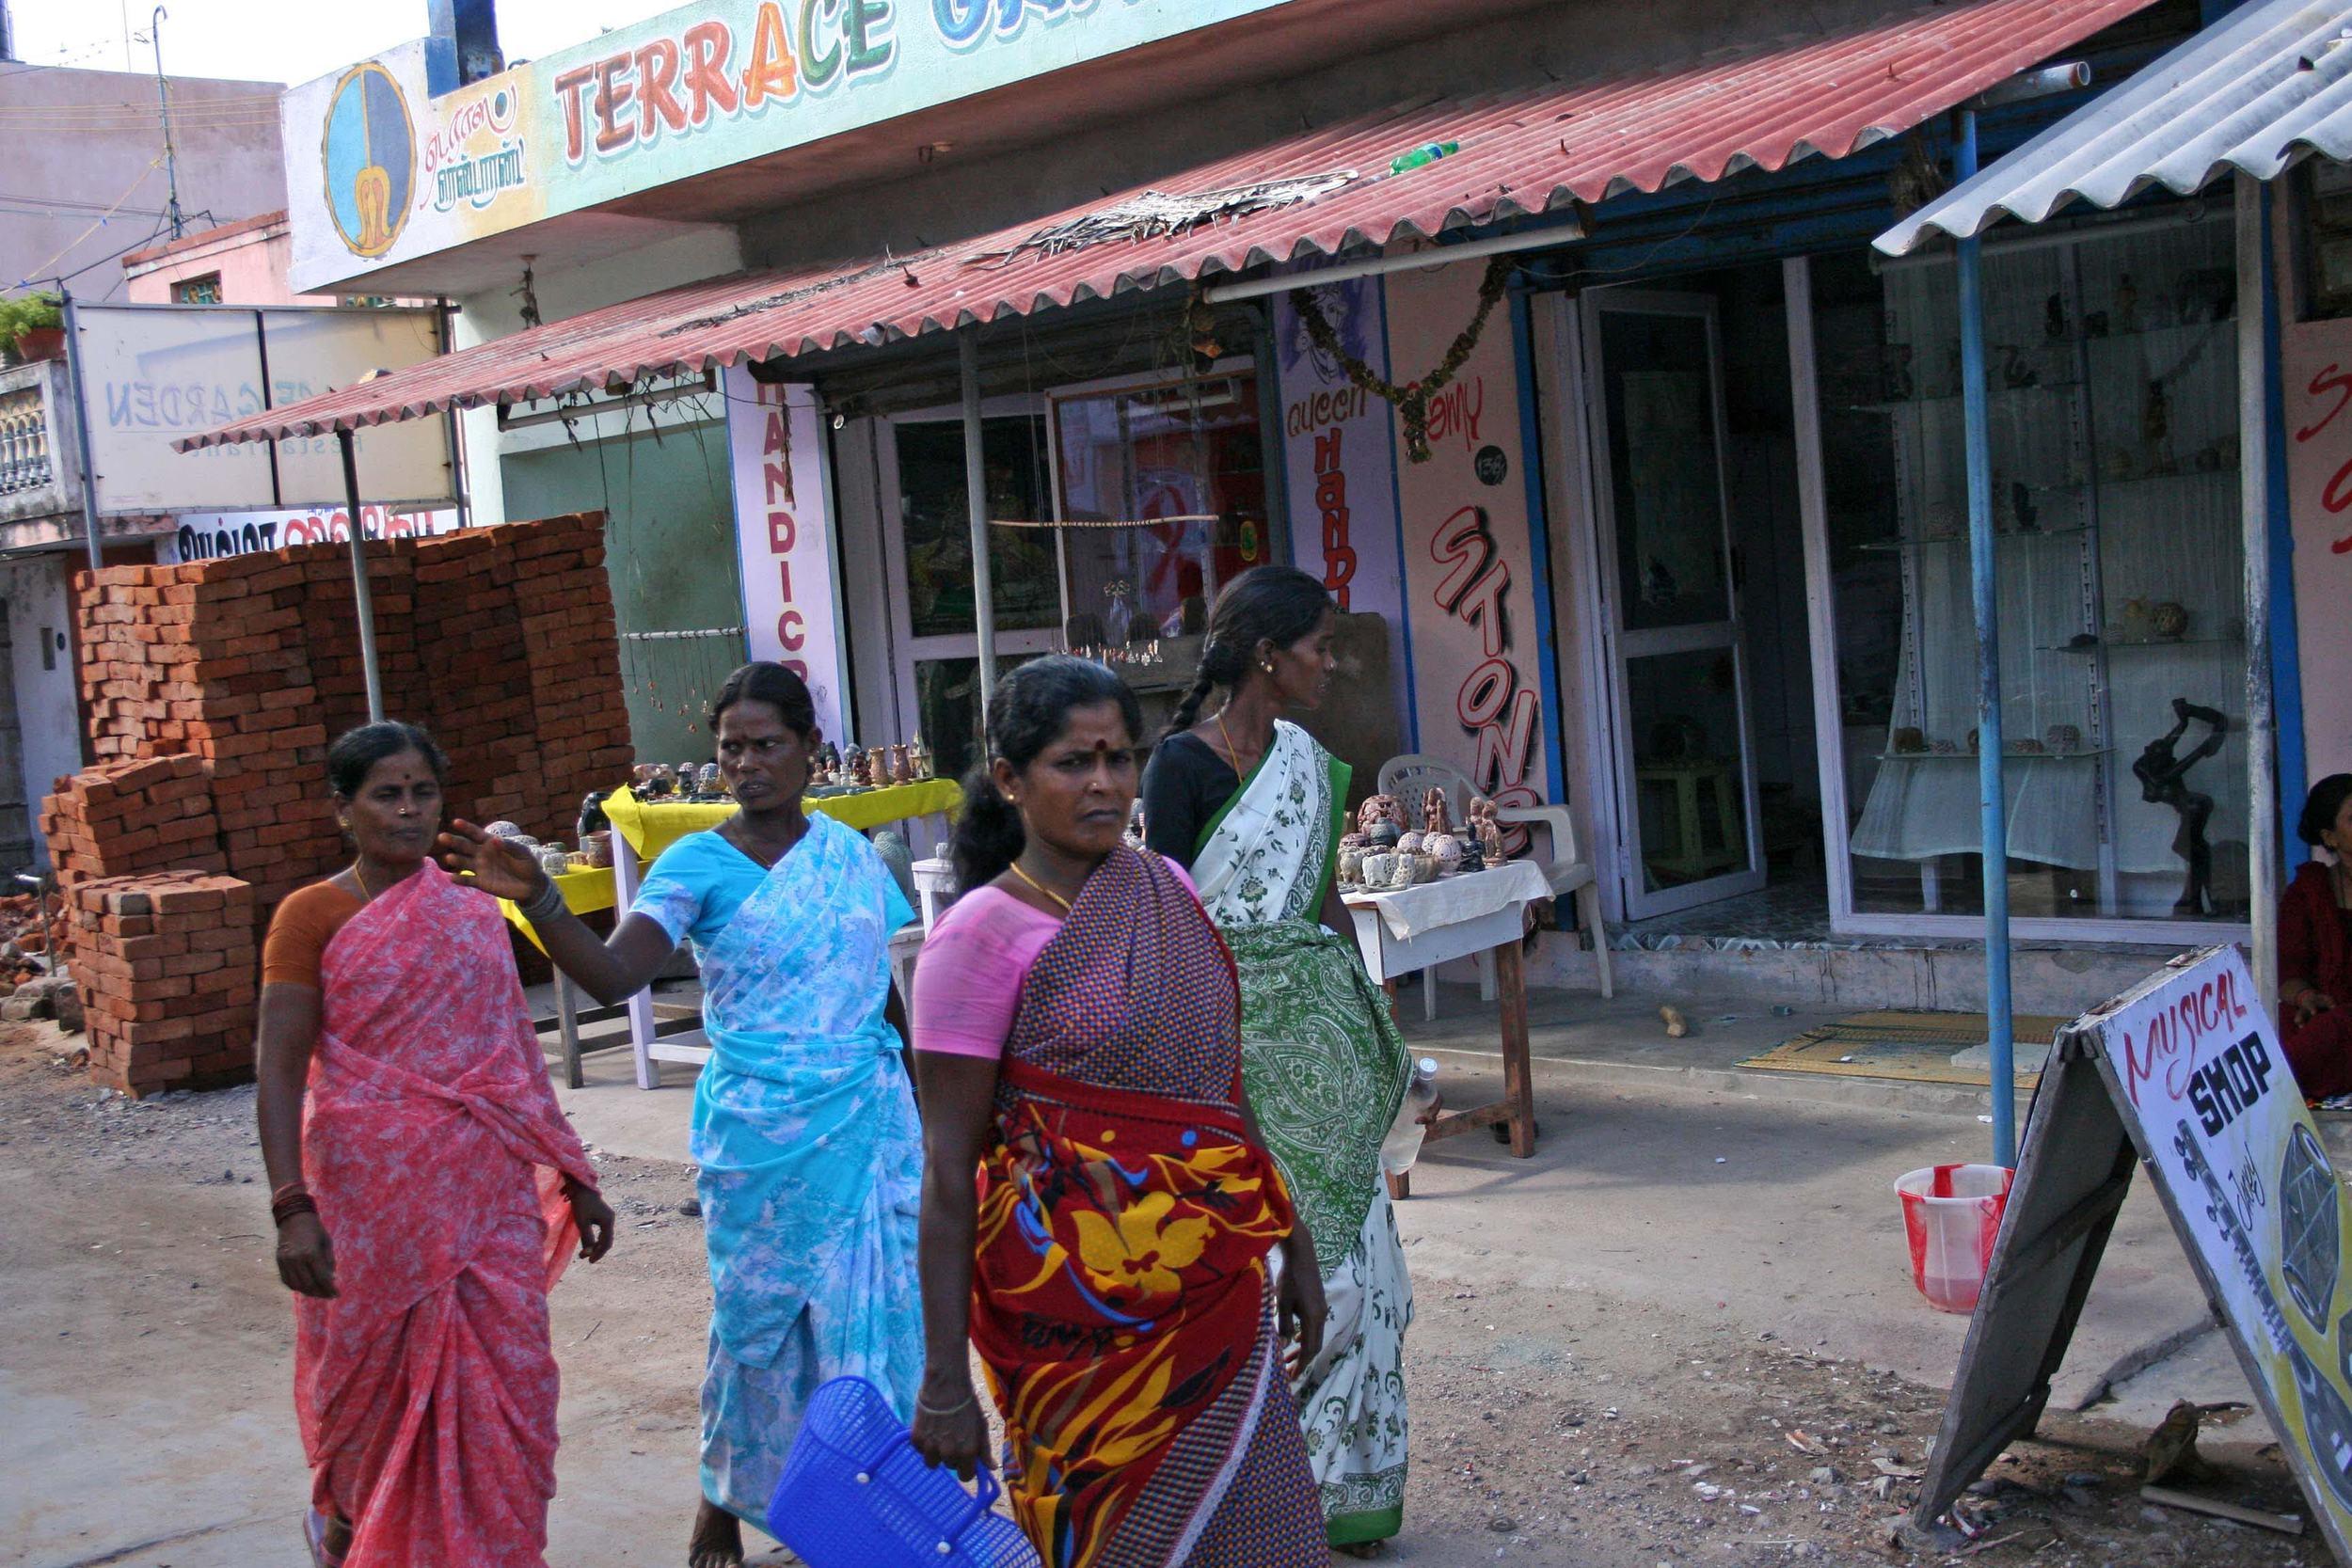 Mamallapuram, India